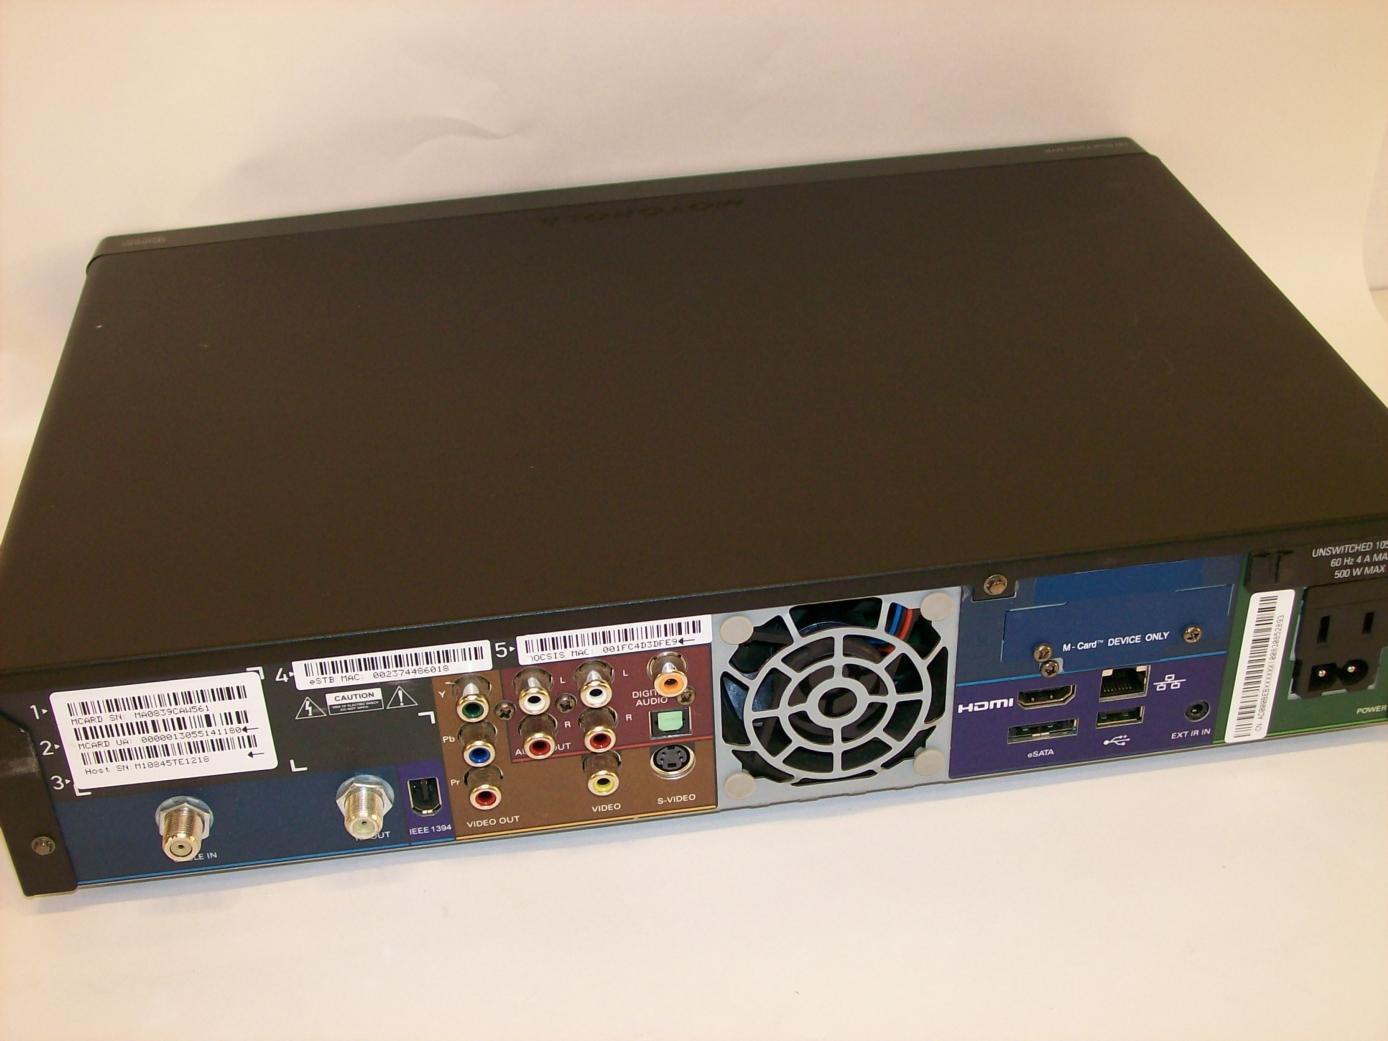 Comcast motorola Box Manual